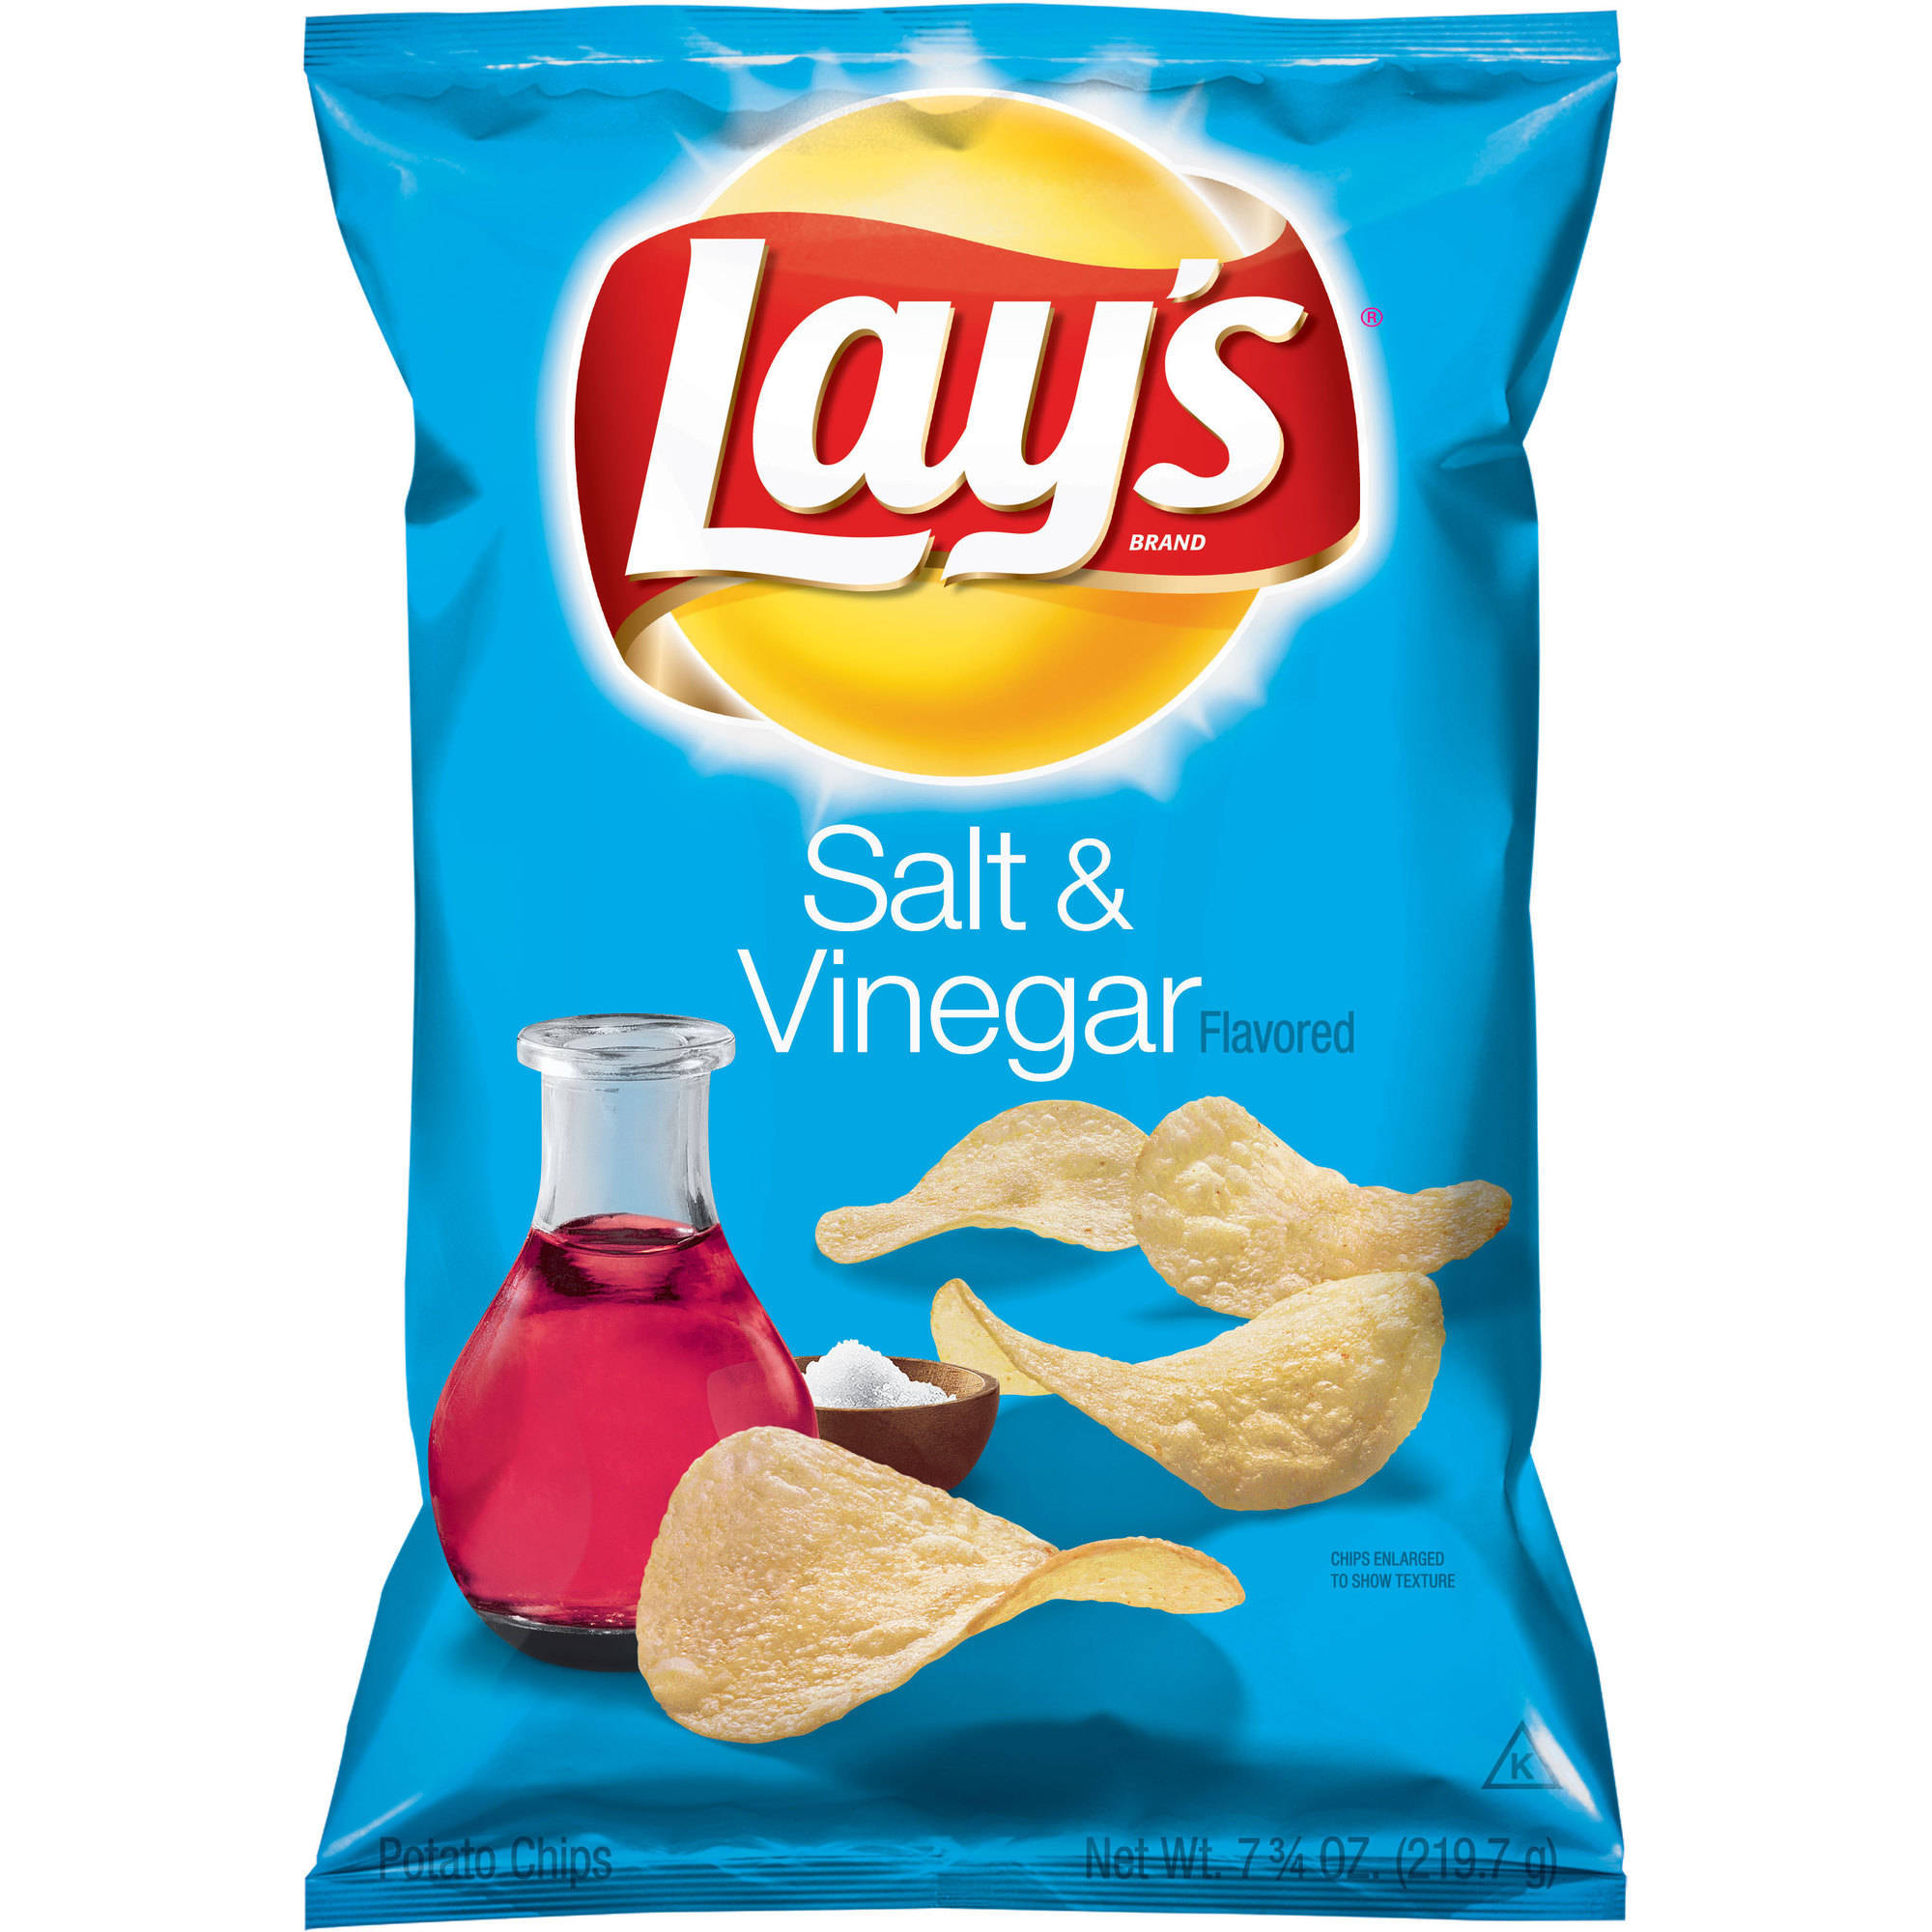 Lays Salt & Vinegar Flavored Potato Chips, 7.75 oz.